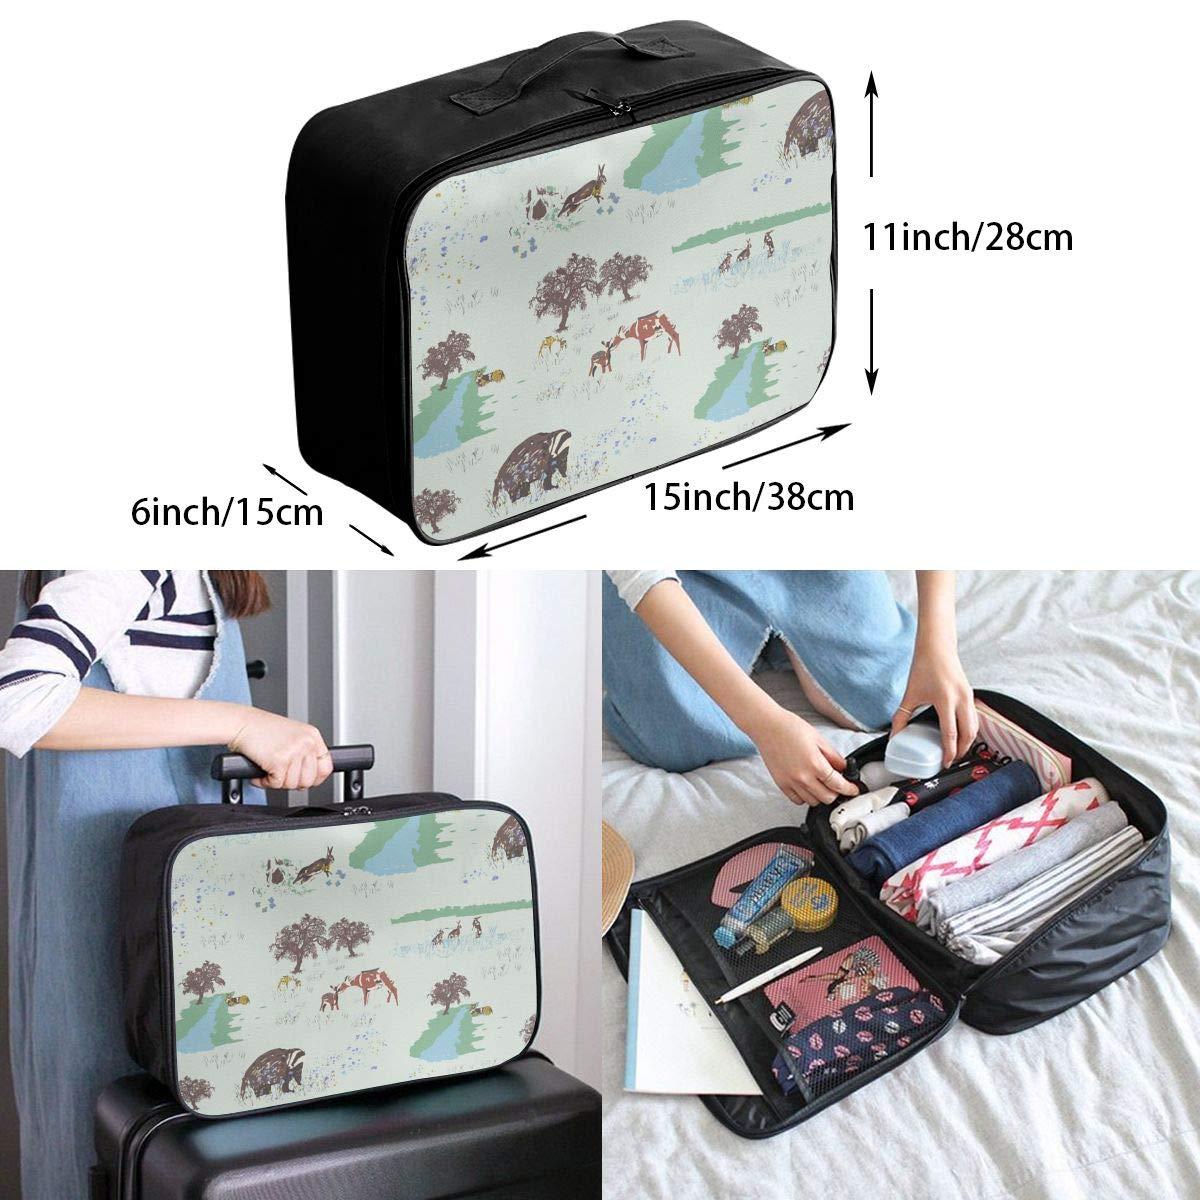 Travel Luggage Duffle Bag Lightweight Portable Handbag Animal Print Large Capacity Waterproof Foldable Storage Tote